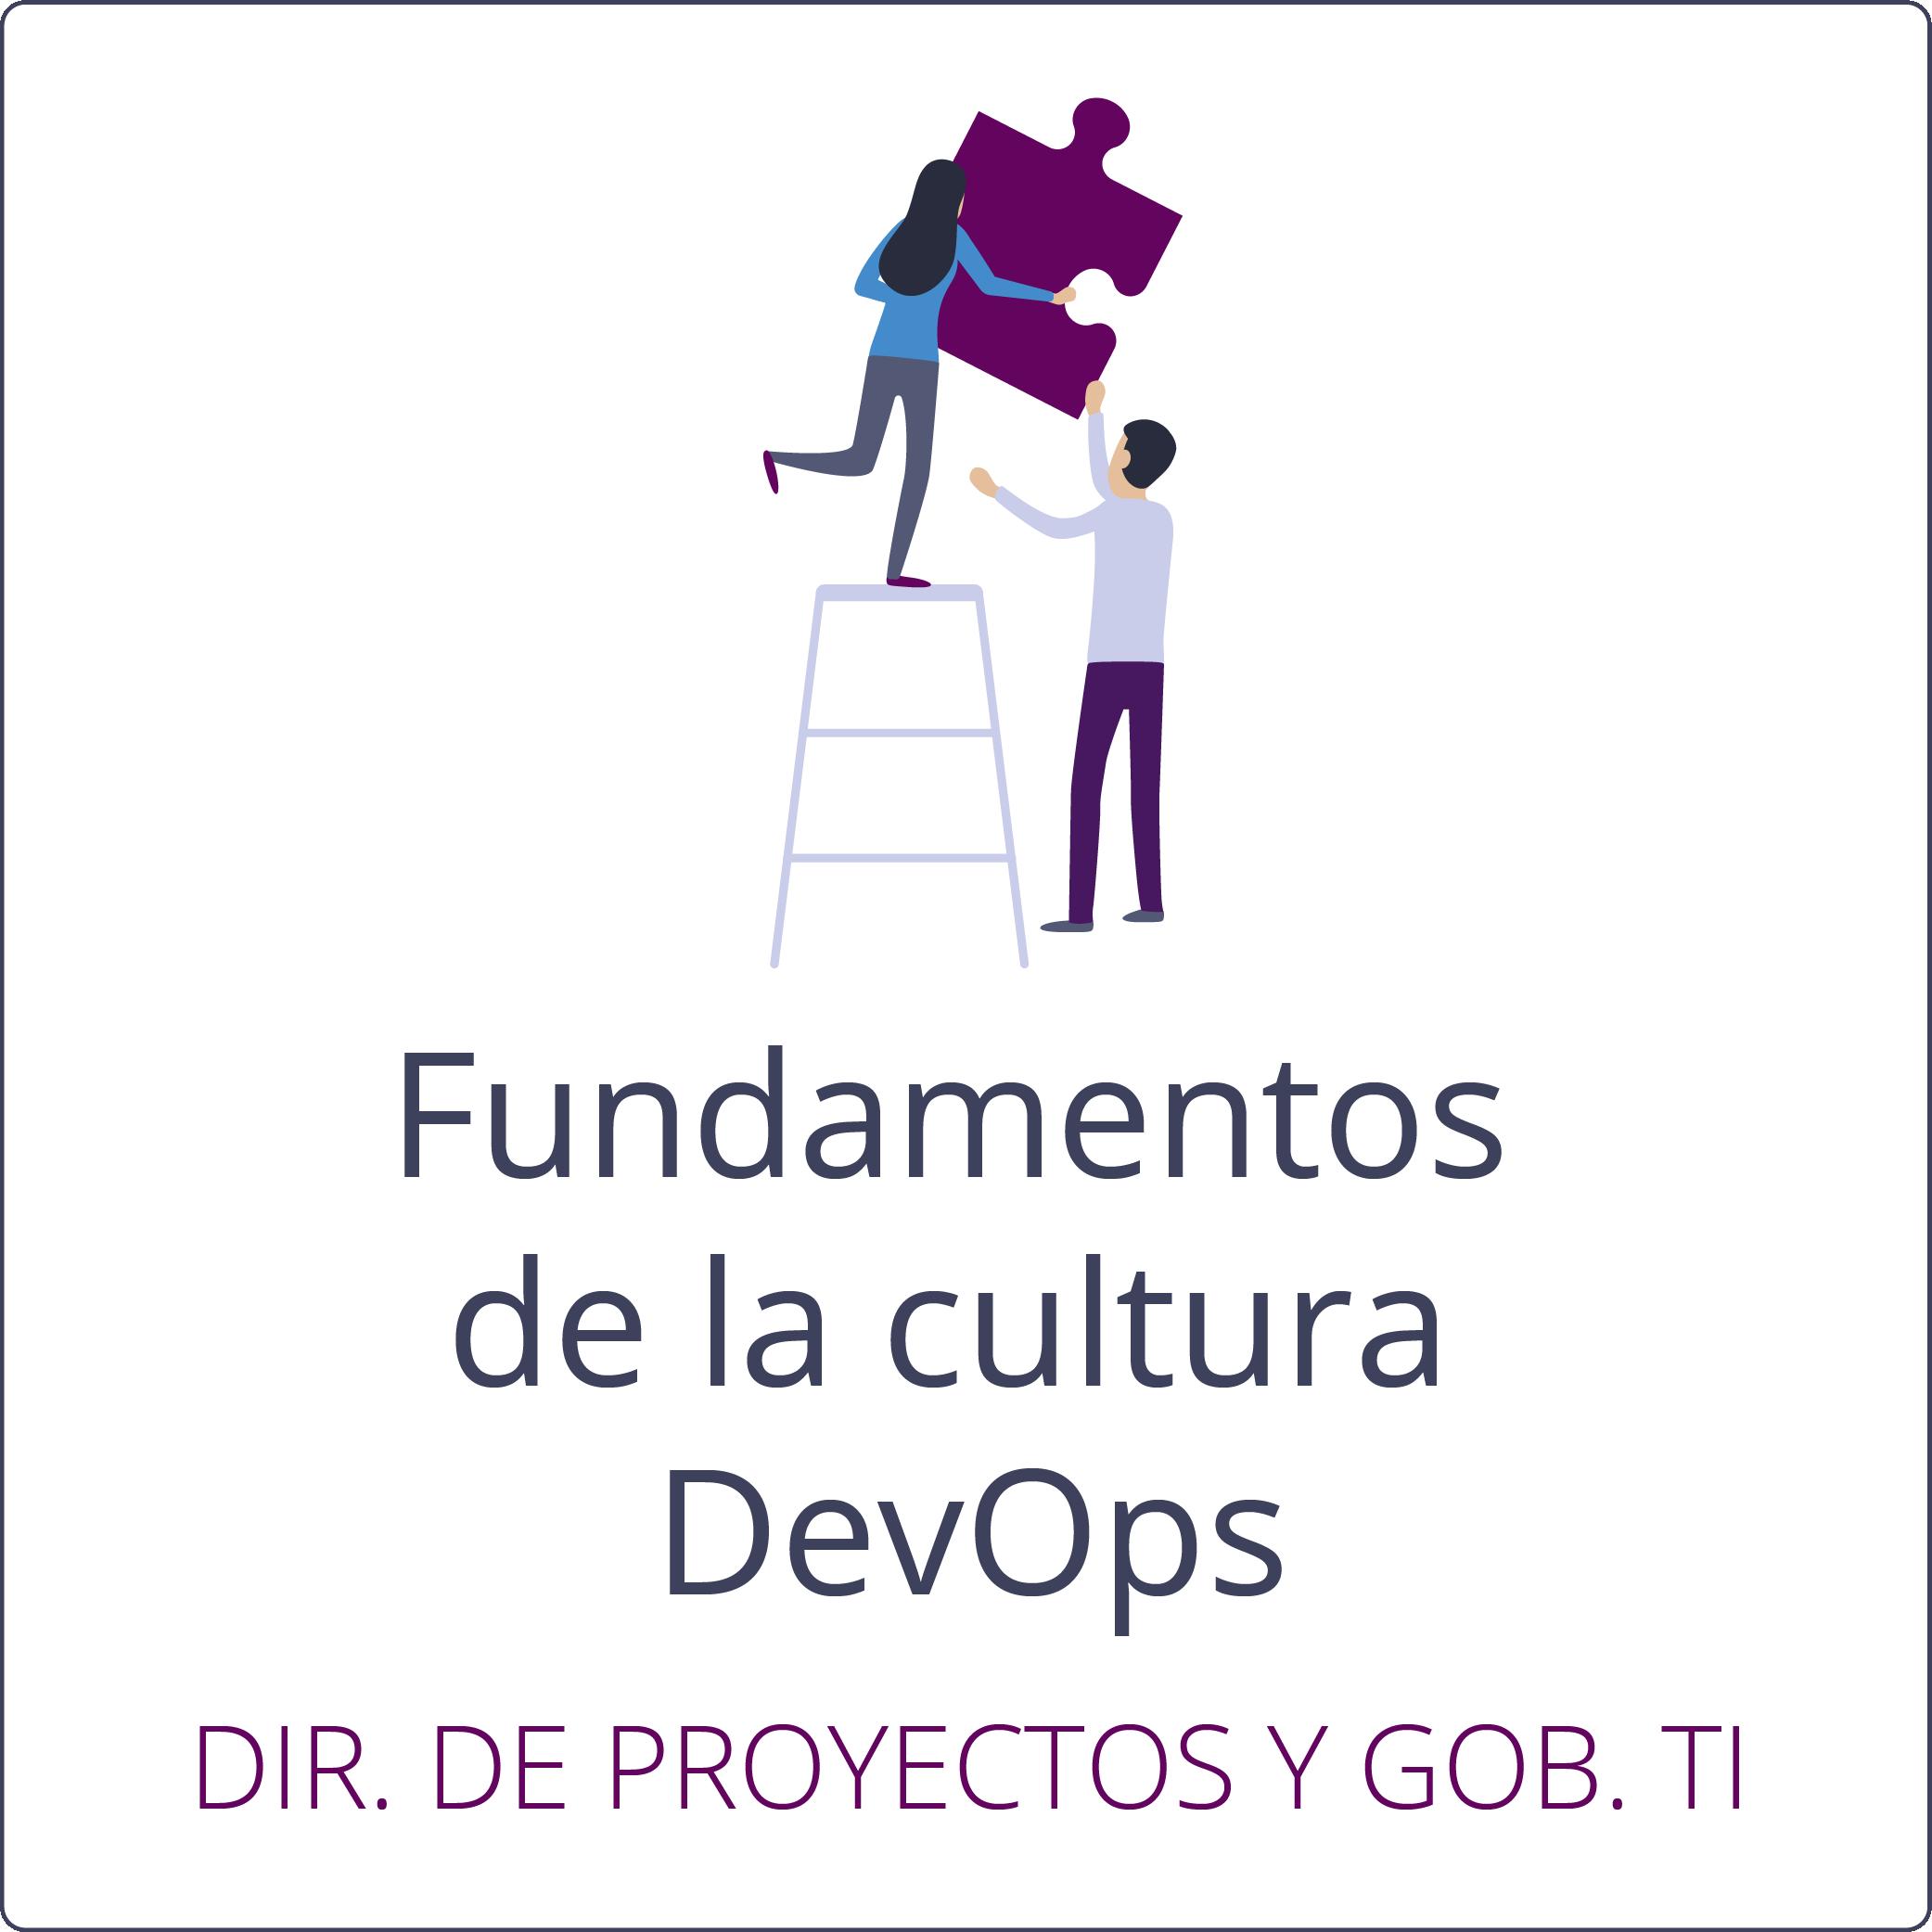 Fundamentos de la cultura DevOps